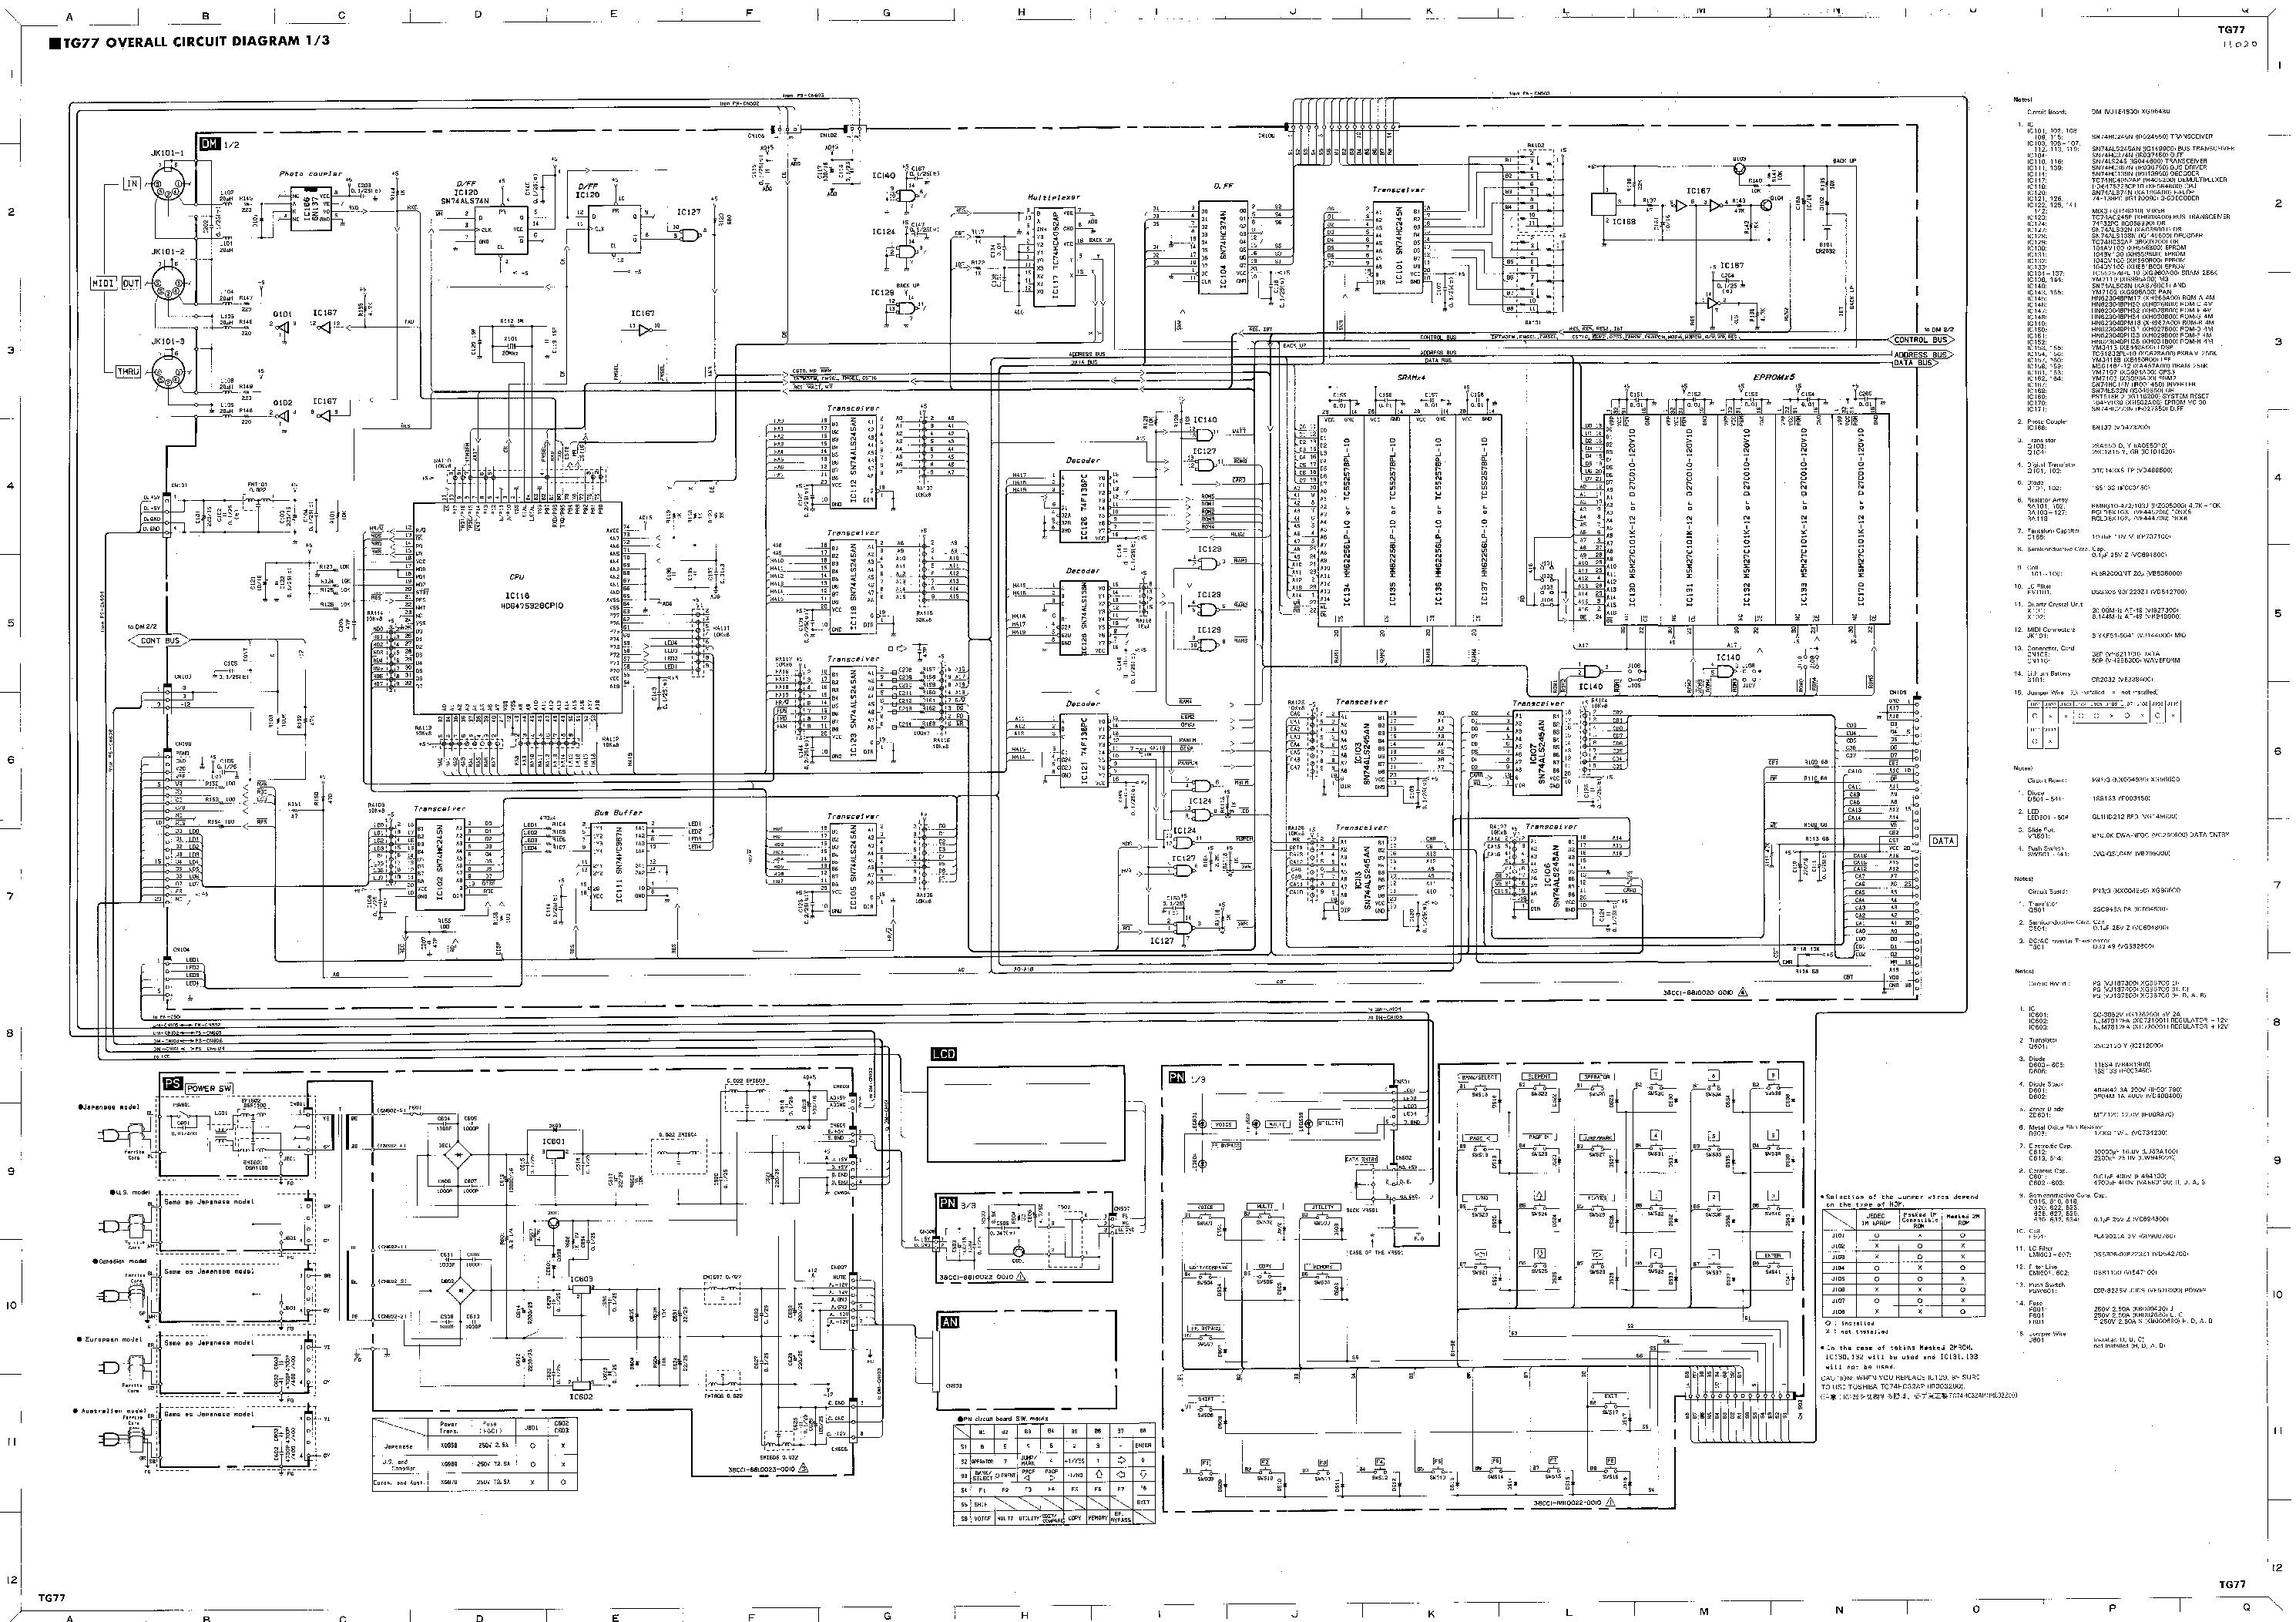 YAMAHA PM3500 SM Service Manual download, schematics, eeprom, repair